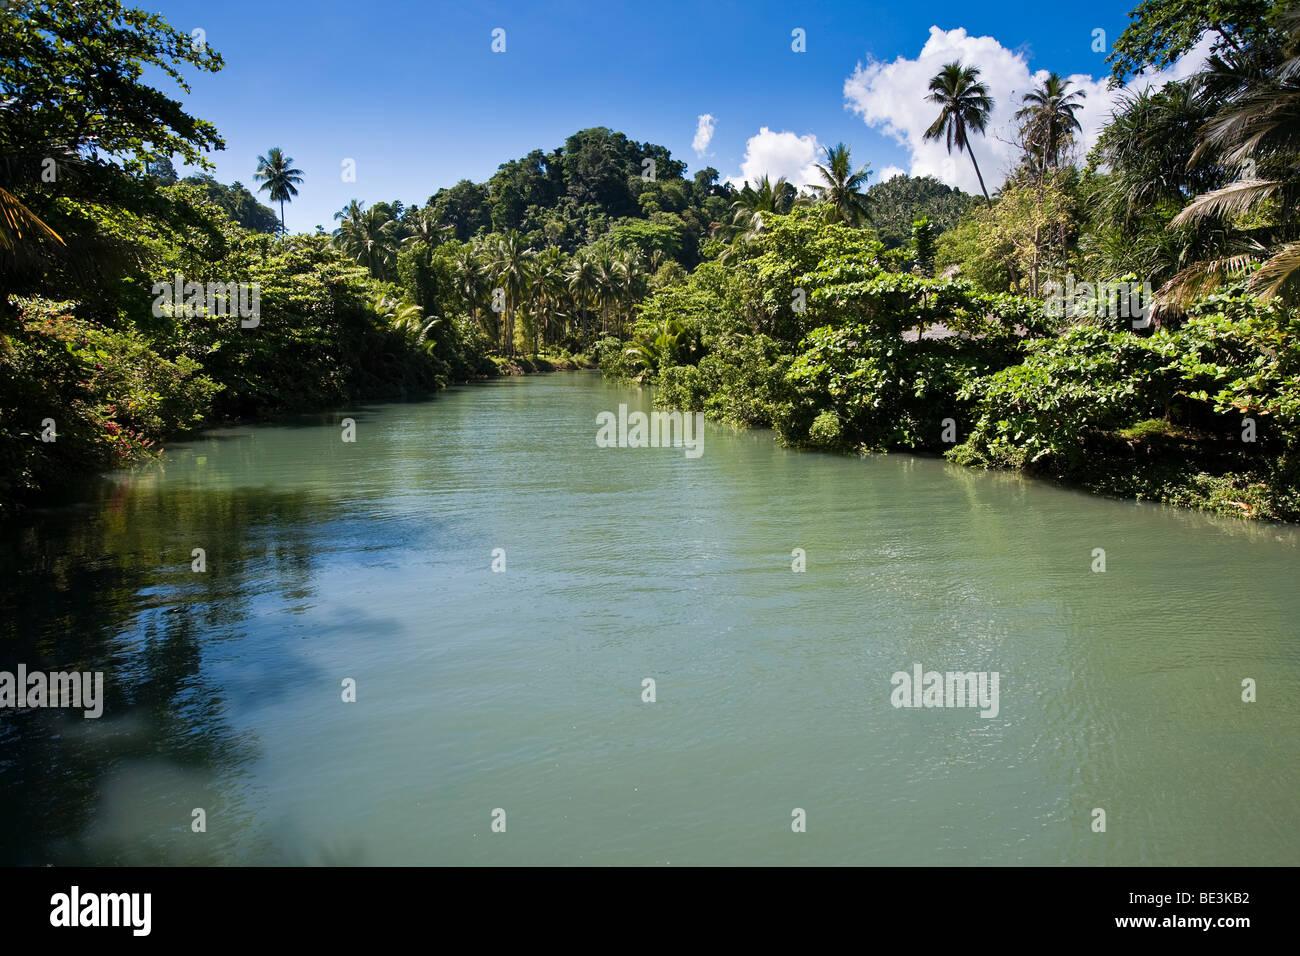 Brackish river, Sulawesi, Indonesia, Southeast Asia - Stock Image